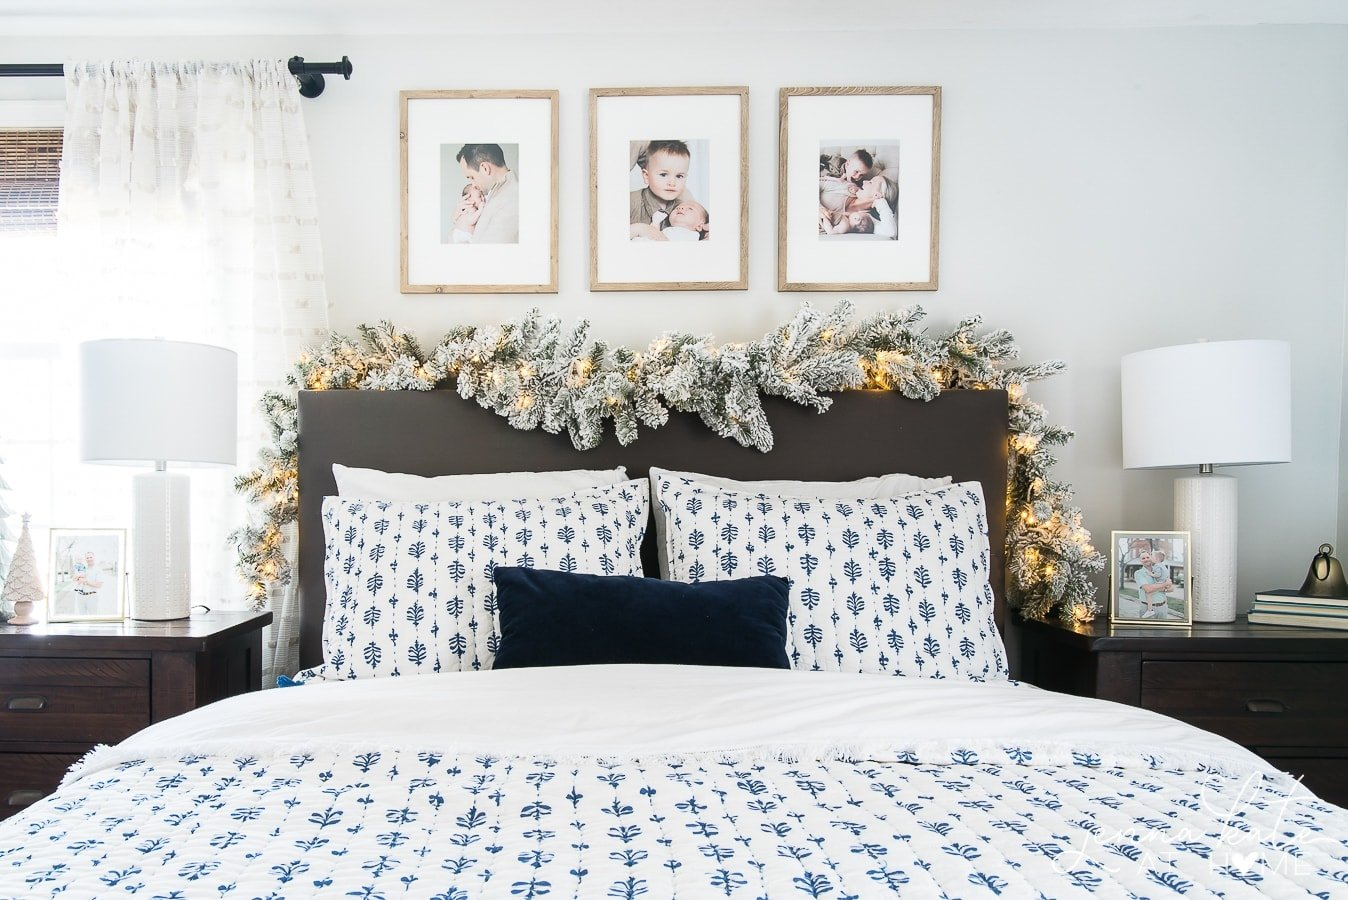 simple Christmas bedroom decor ideas